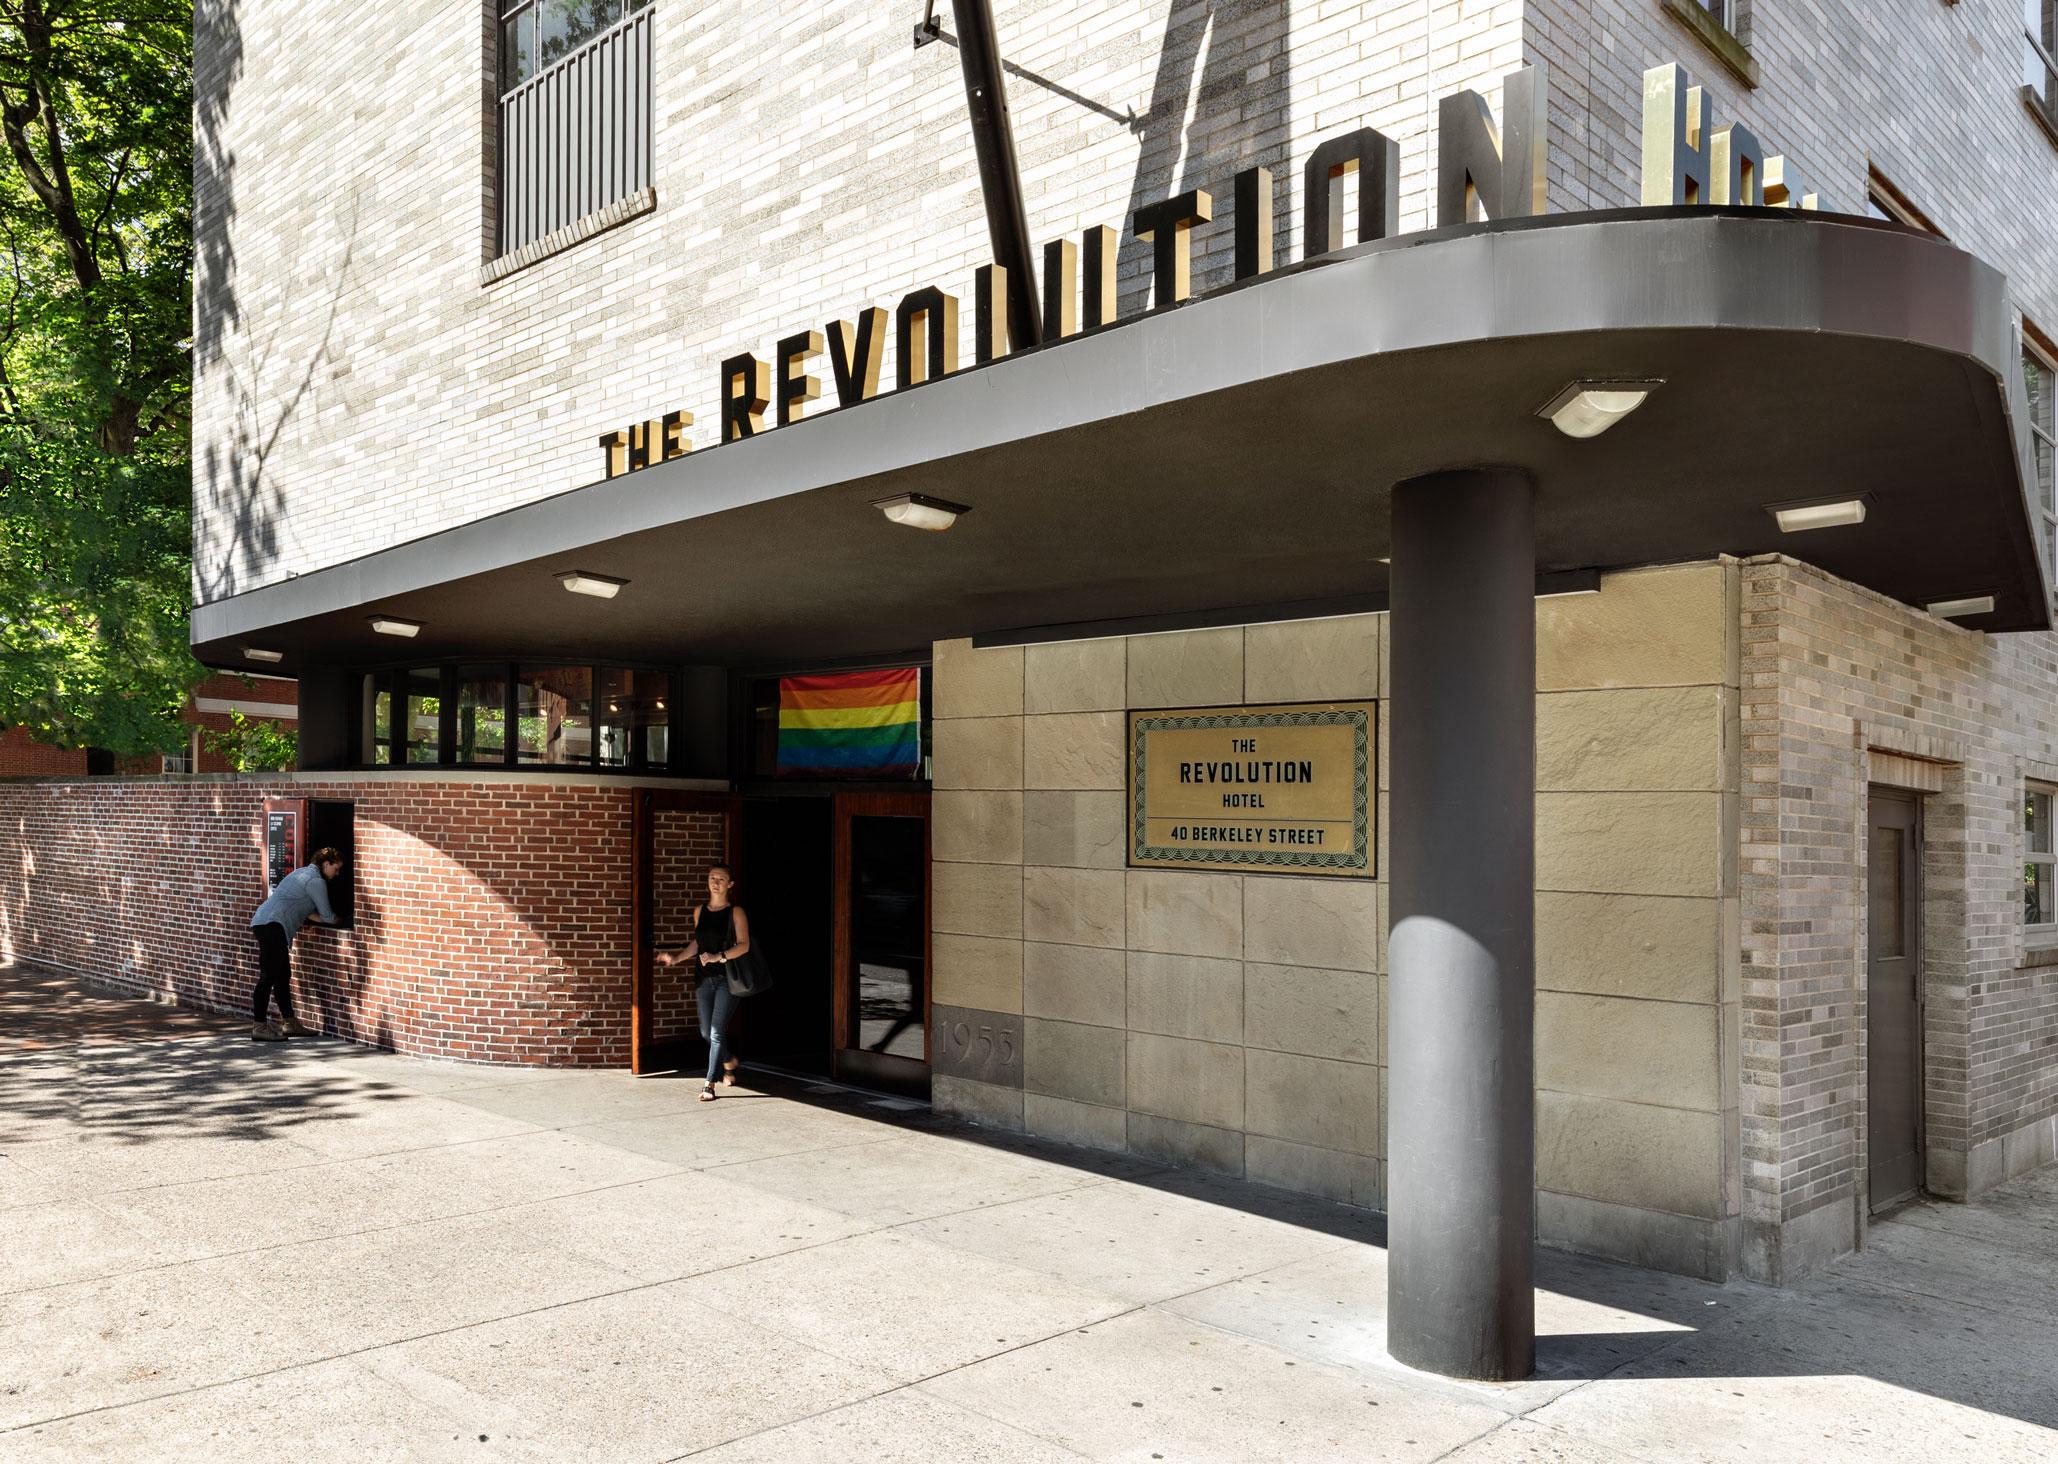 Revolution Hotel Entrance